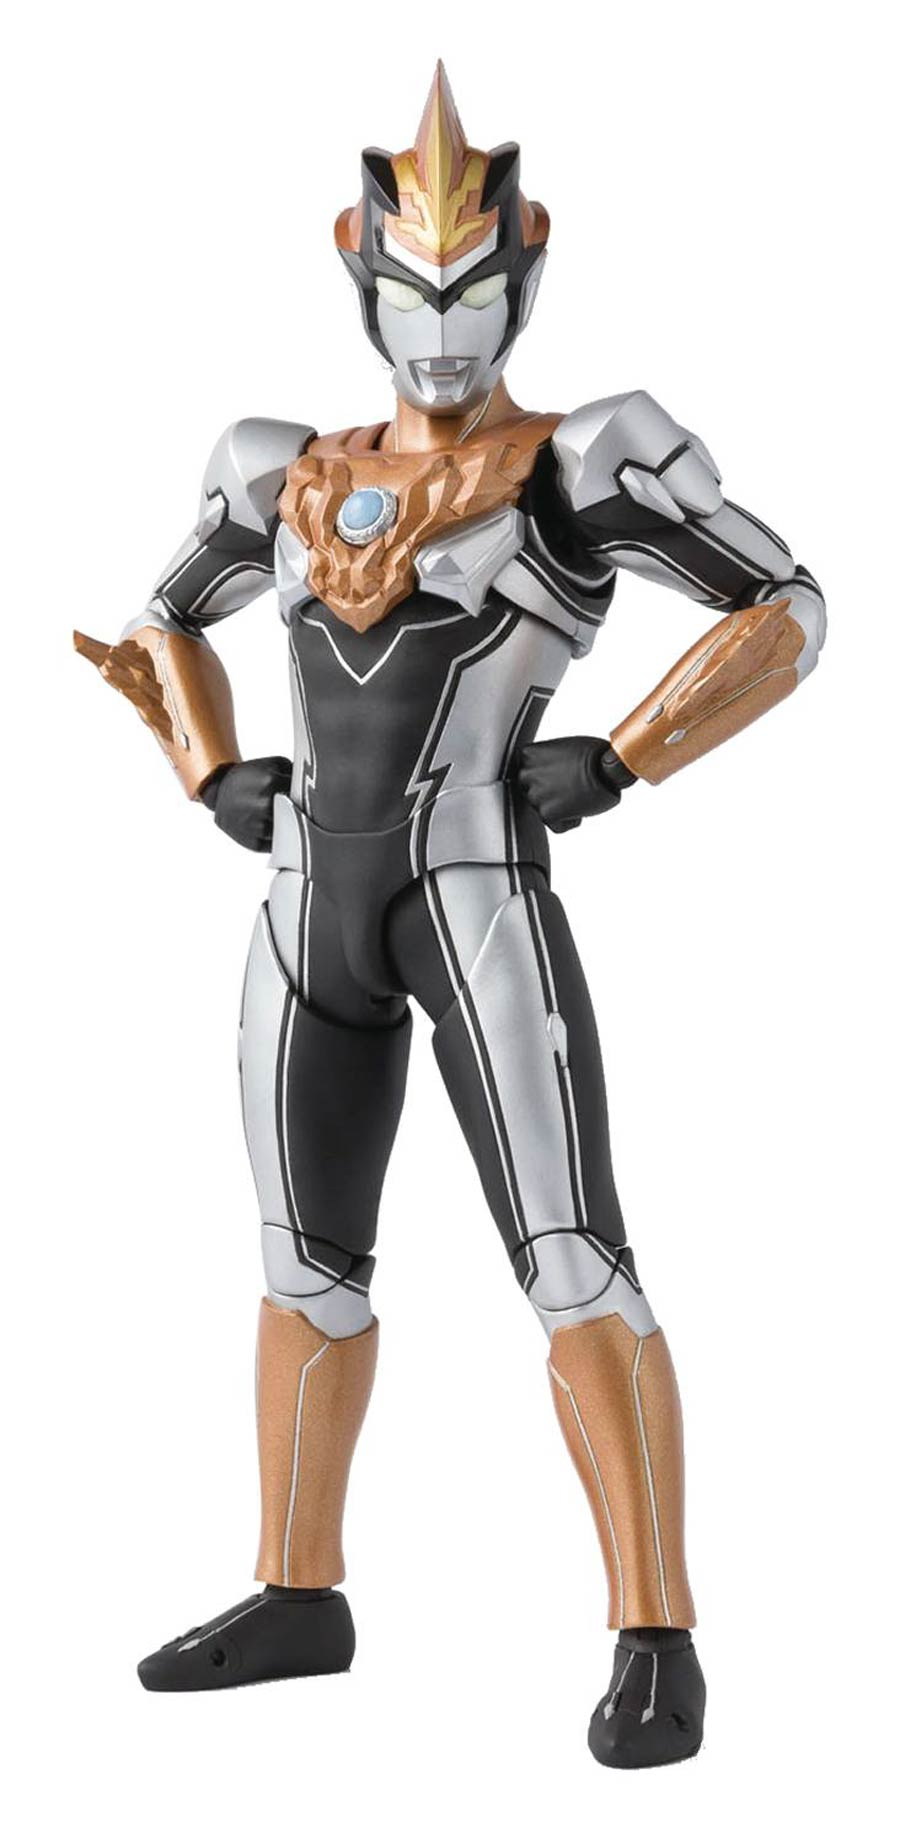 Ultraman R/B S. H. Figuarts - Ultraman Blu Ground Action Figure